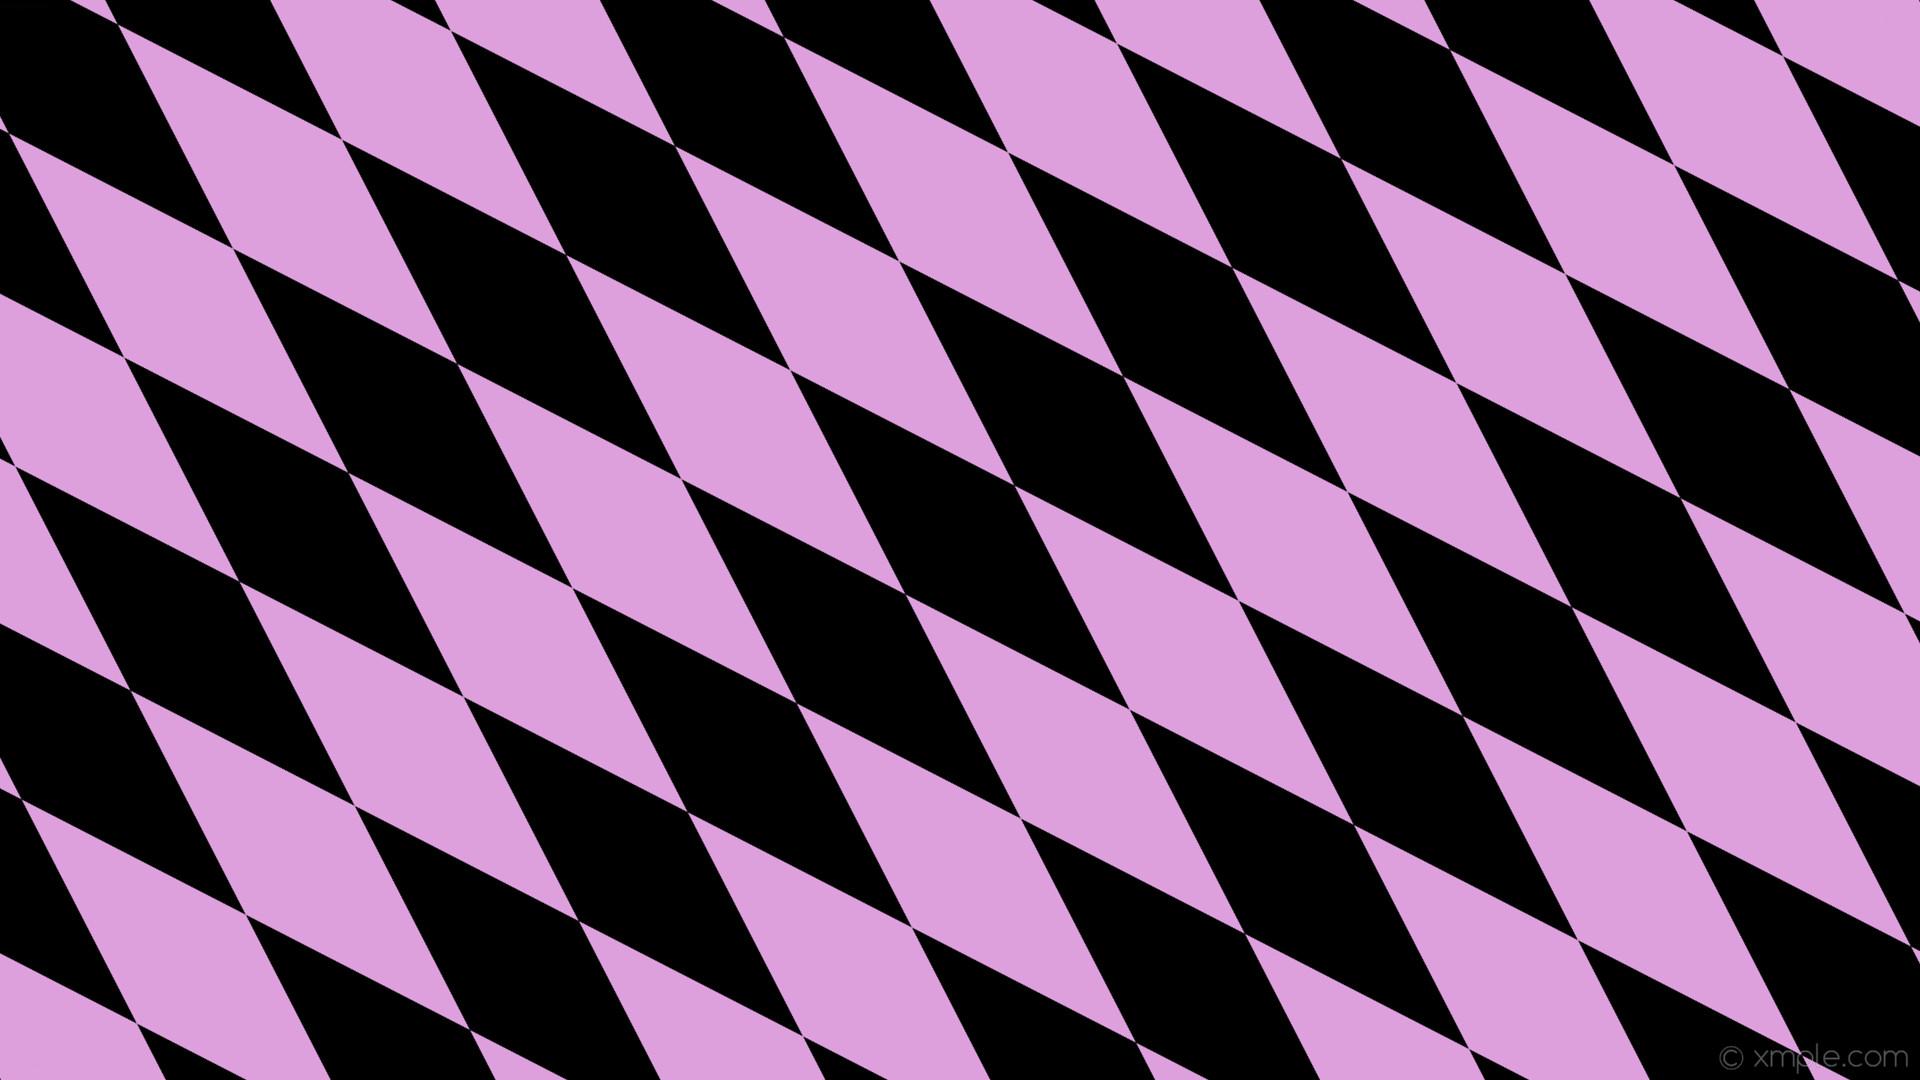 wallpaper lozenge black rhombus purple diamond plum #000000 #dda0dd 135°  480px 154px